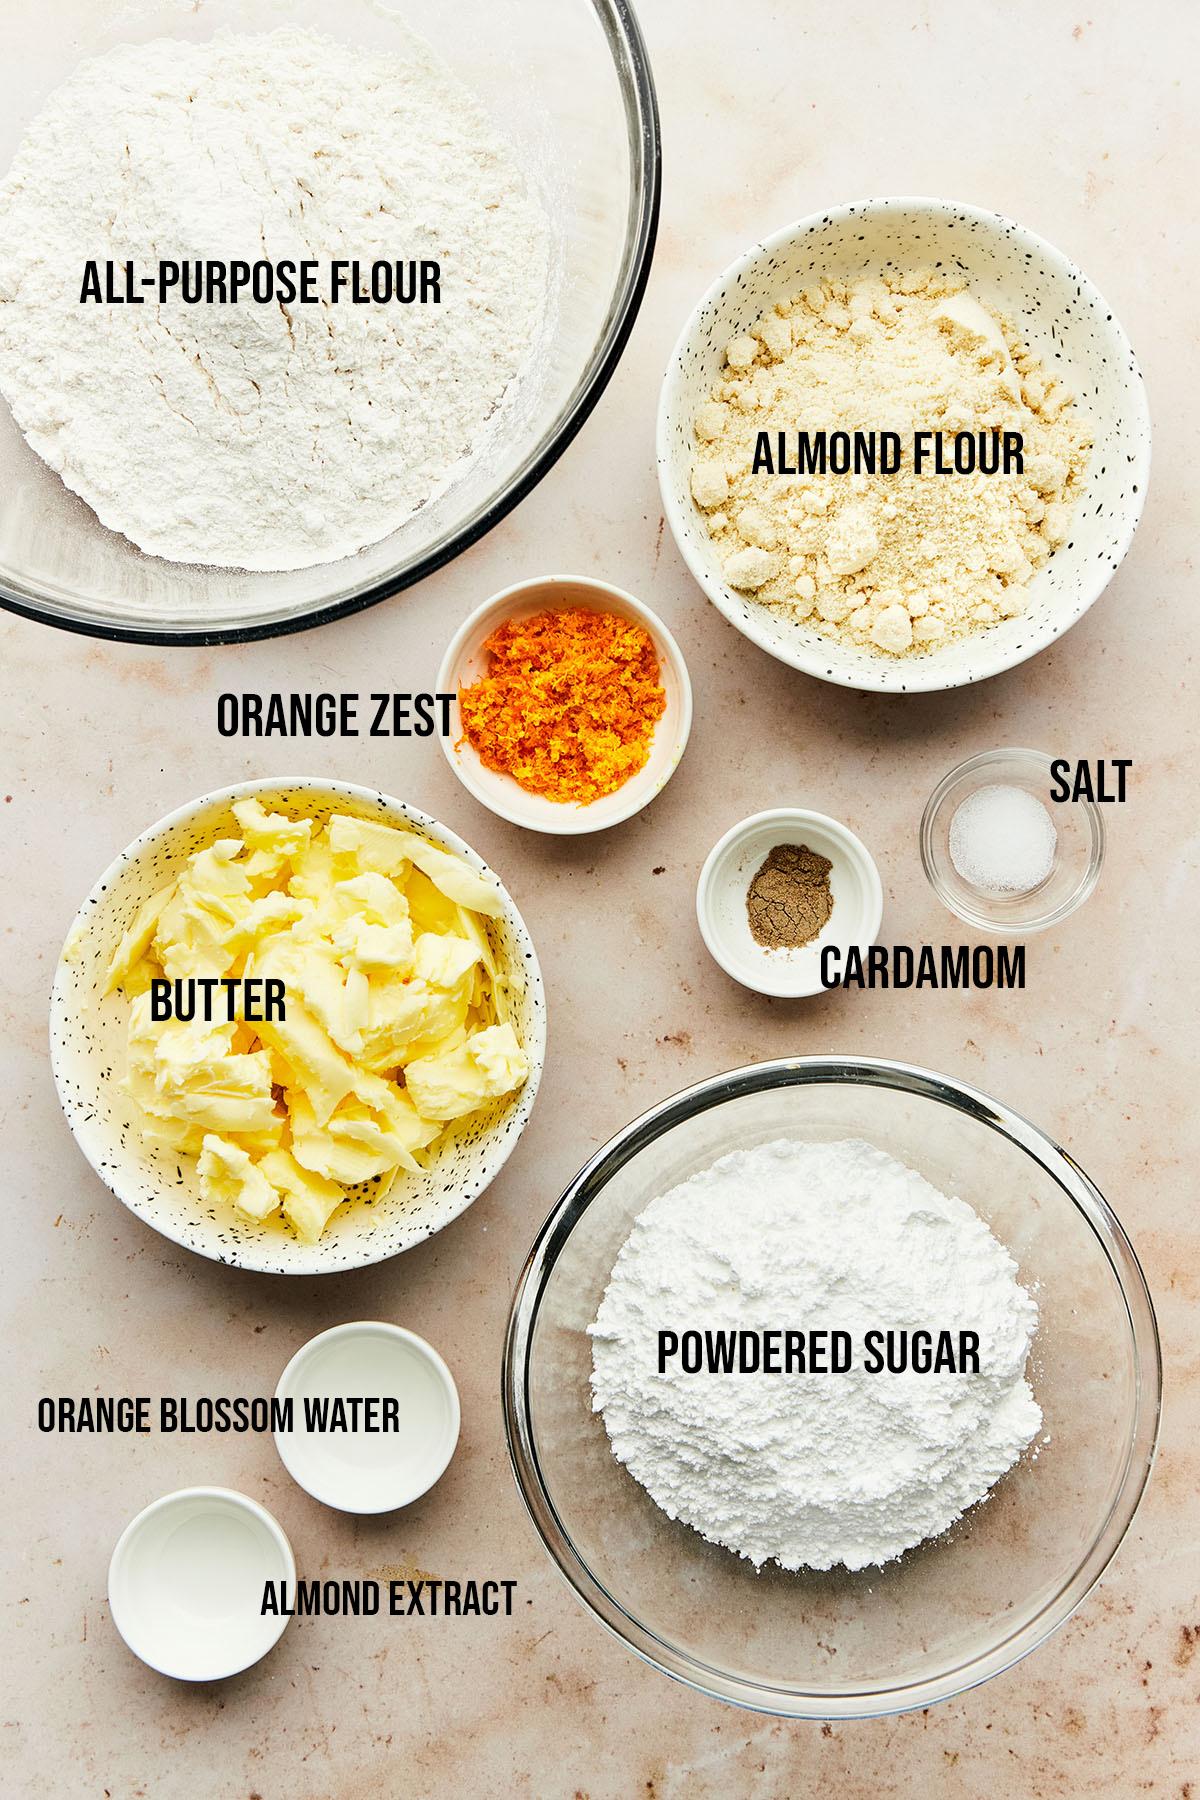 Ingredients to make Mexican wedding cookies.